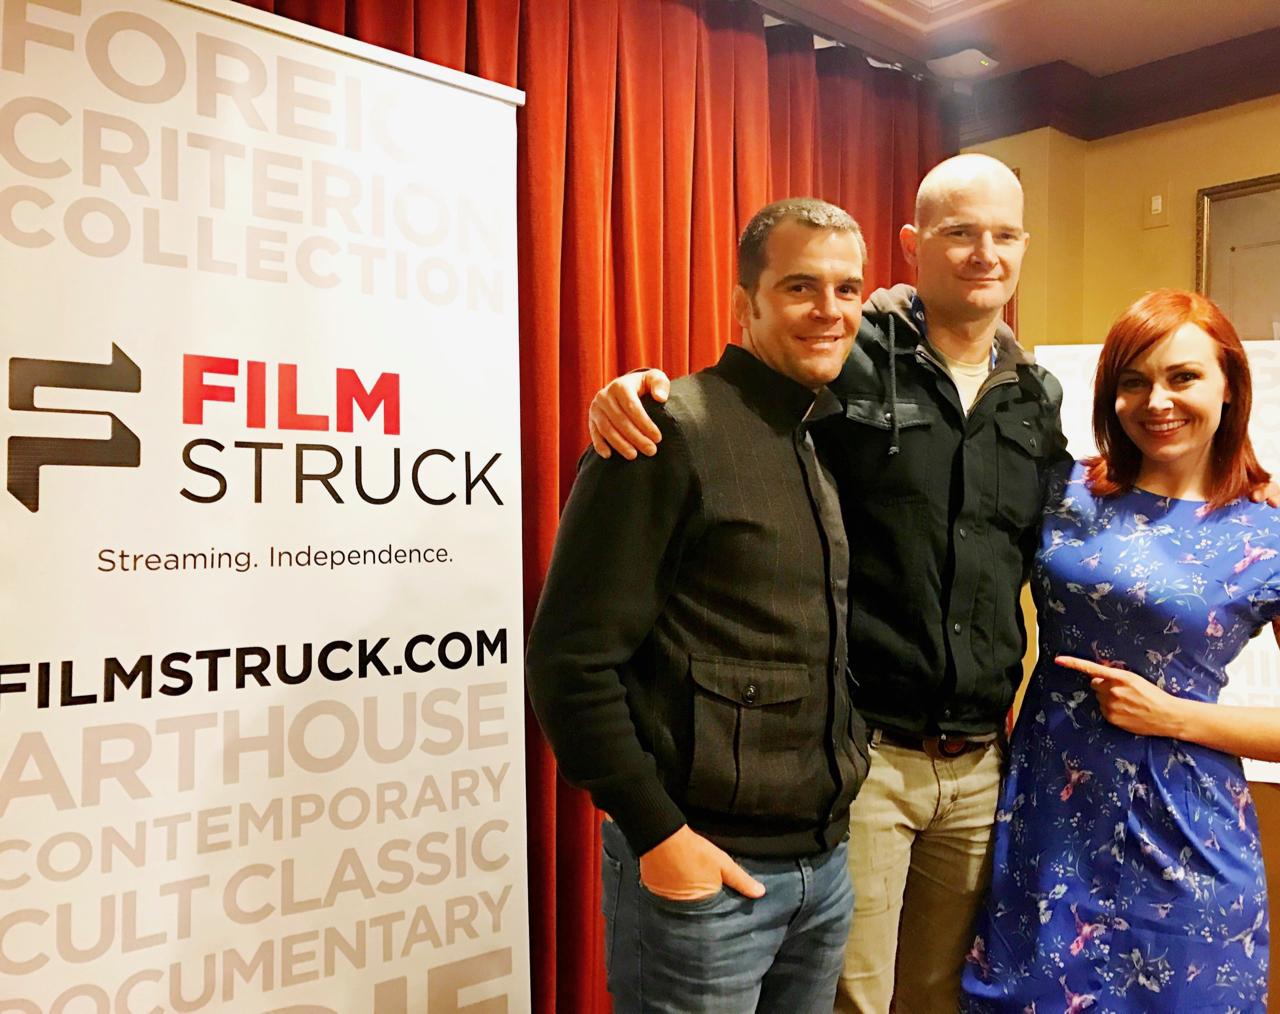 FilmStruck: Nelms Bros. - FilmStruck's Alicia Malone interviewed the Nelms Bros.